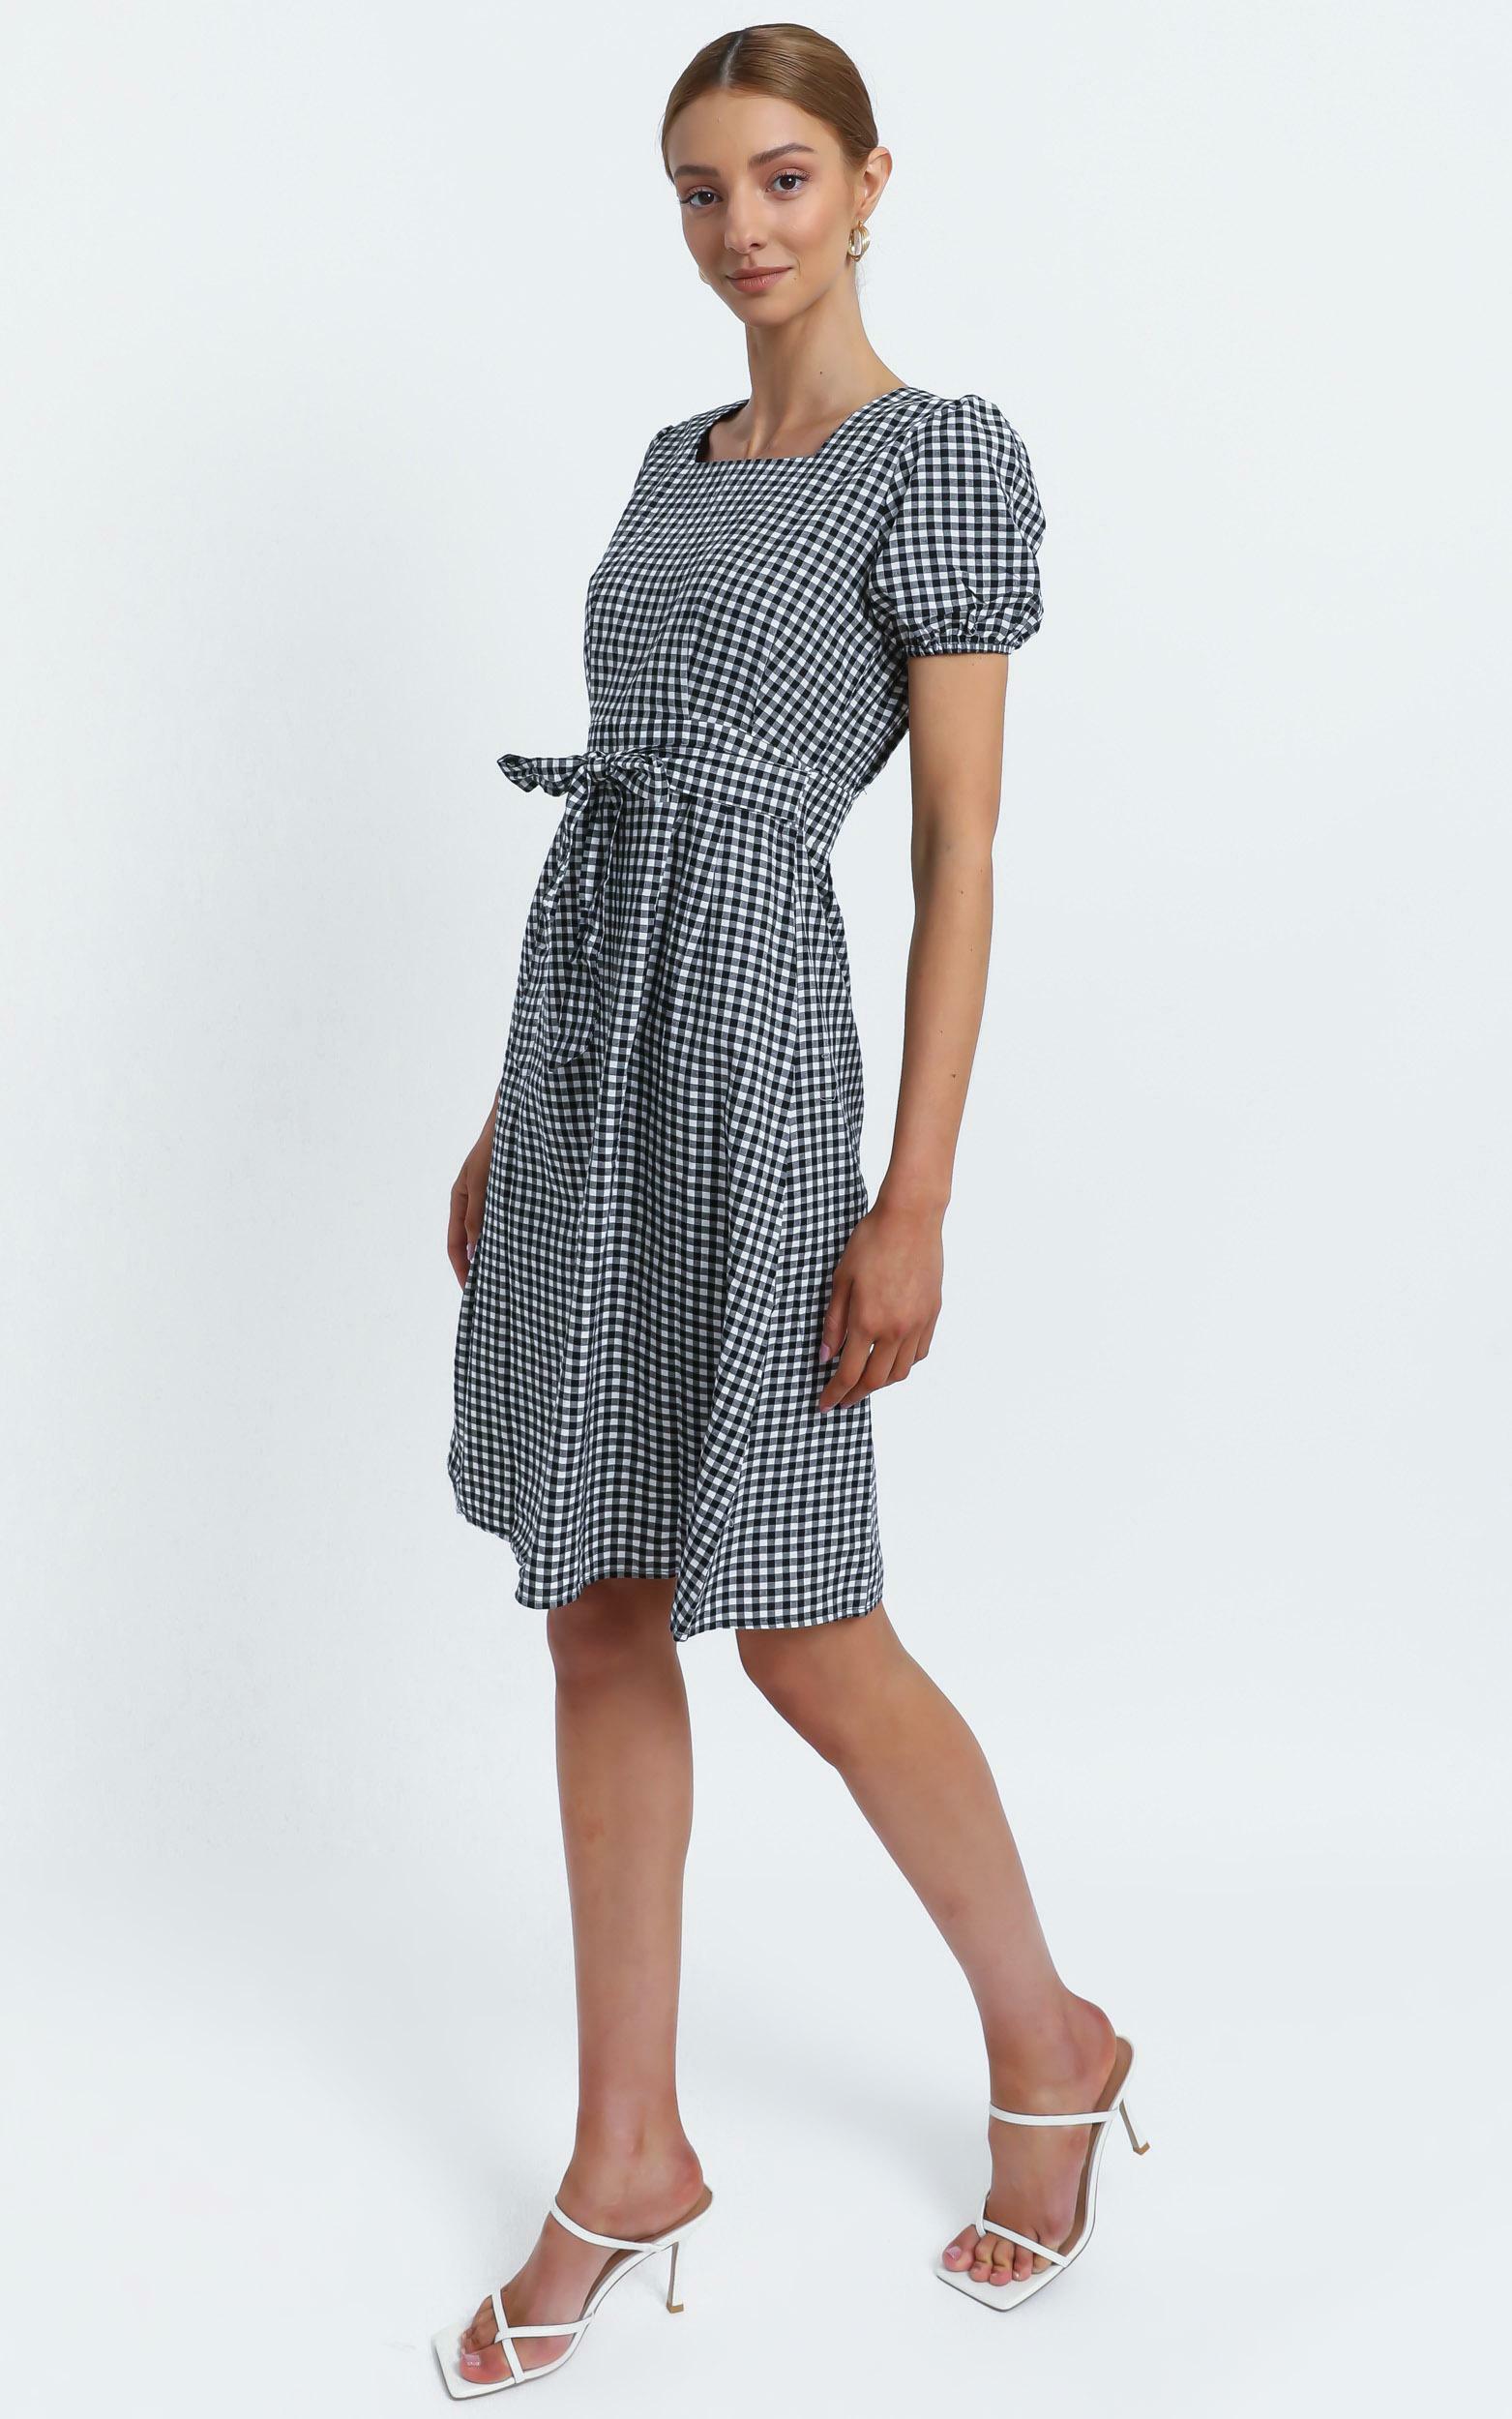 Desiree Dress in Black Check - 12 (L), Black, hi-res image number null